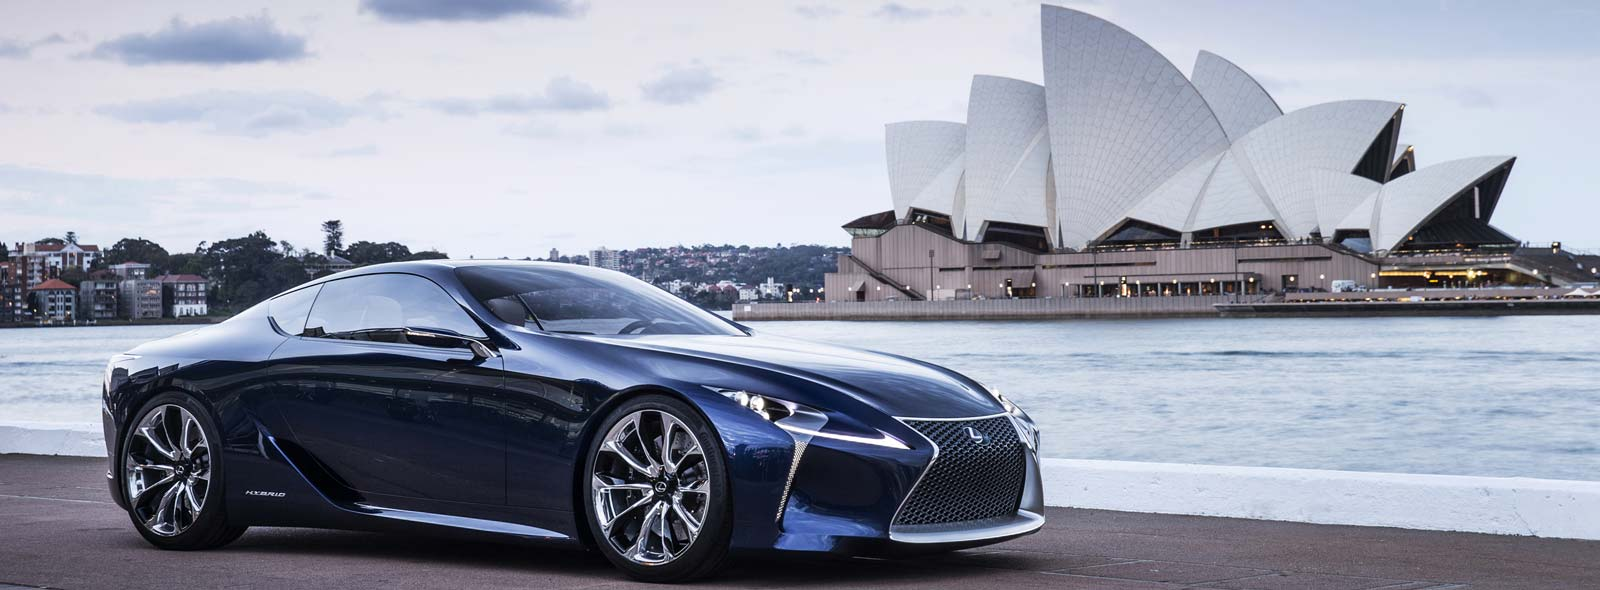 Аэродинамический концепт кар Lexus LF LC